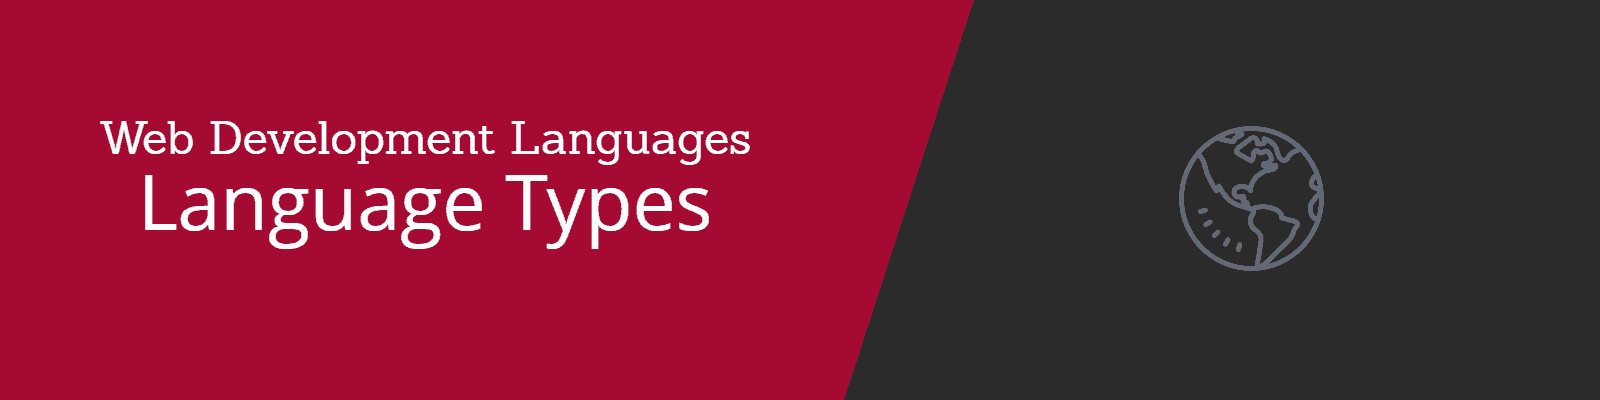 Programming and Web Development - Language Types